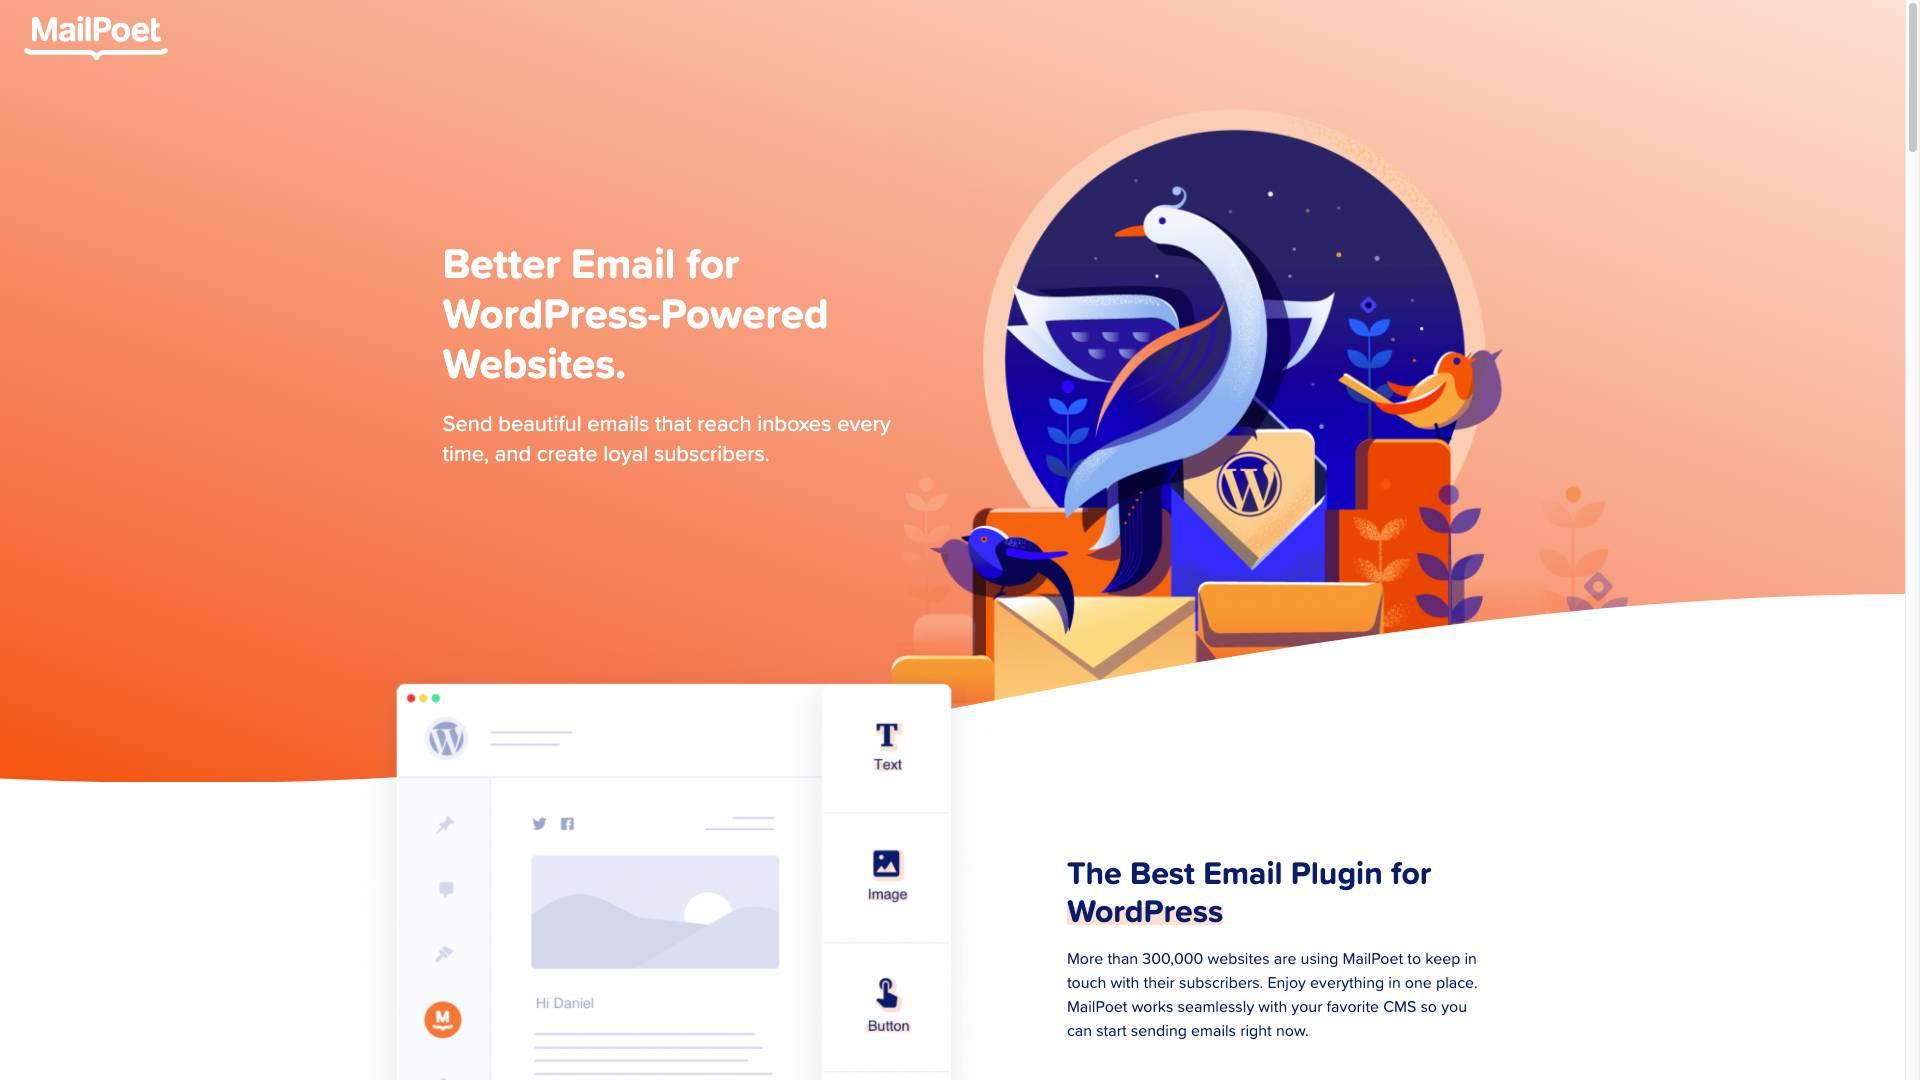 MailPoet为WordPress用户提供电子邮件营销